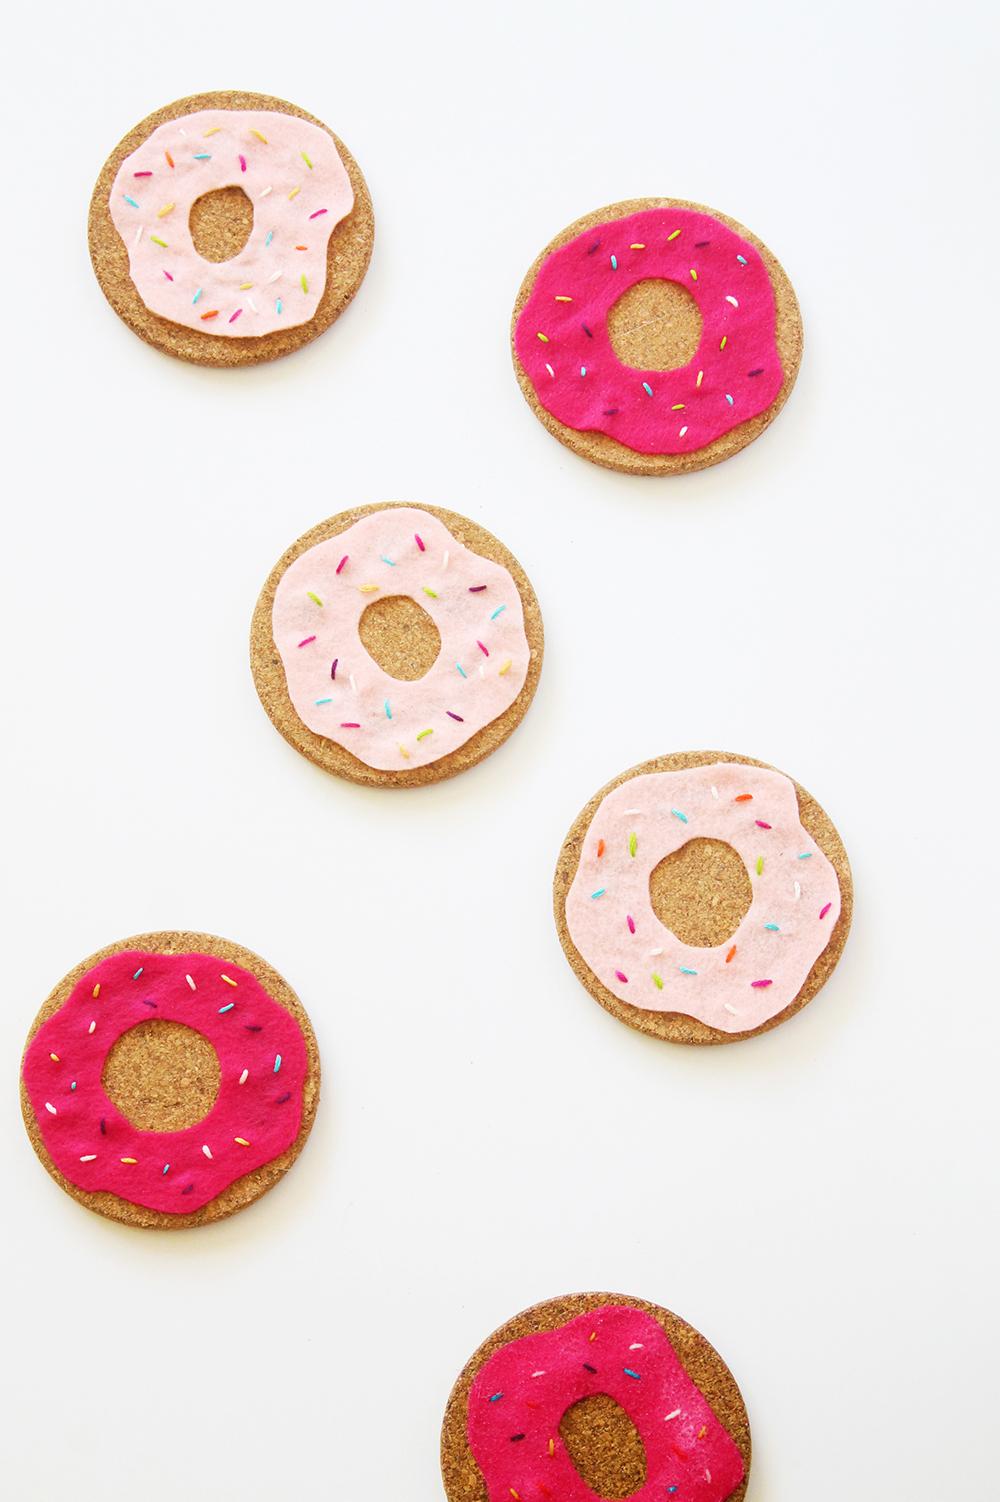 DIY felt and cork donut coasters